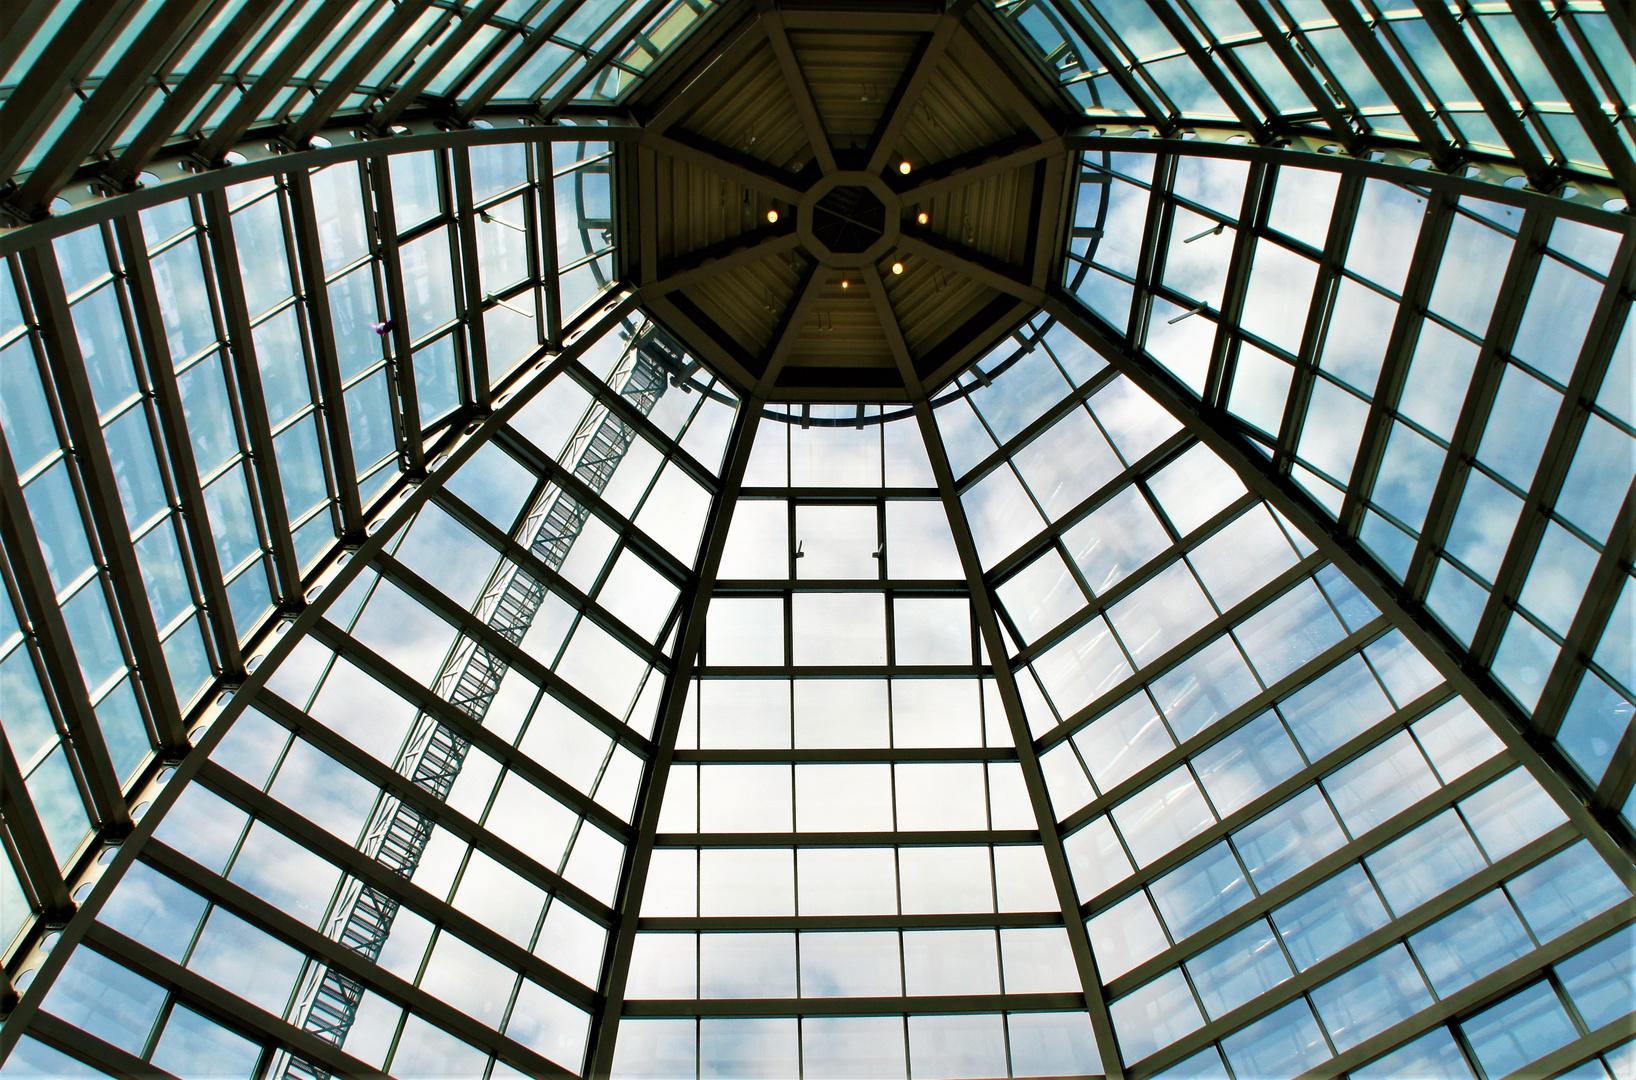 Glasgewölbe